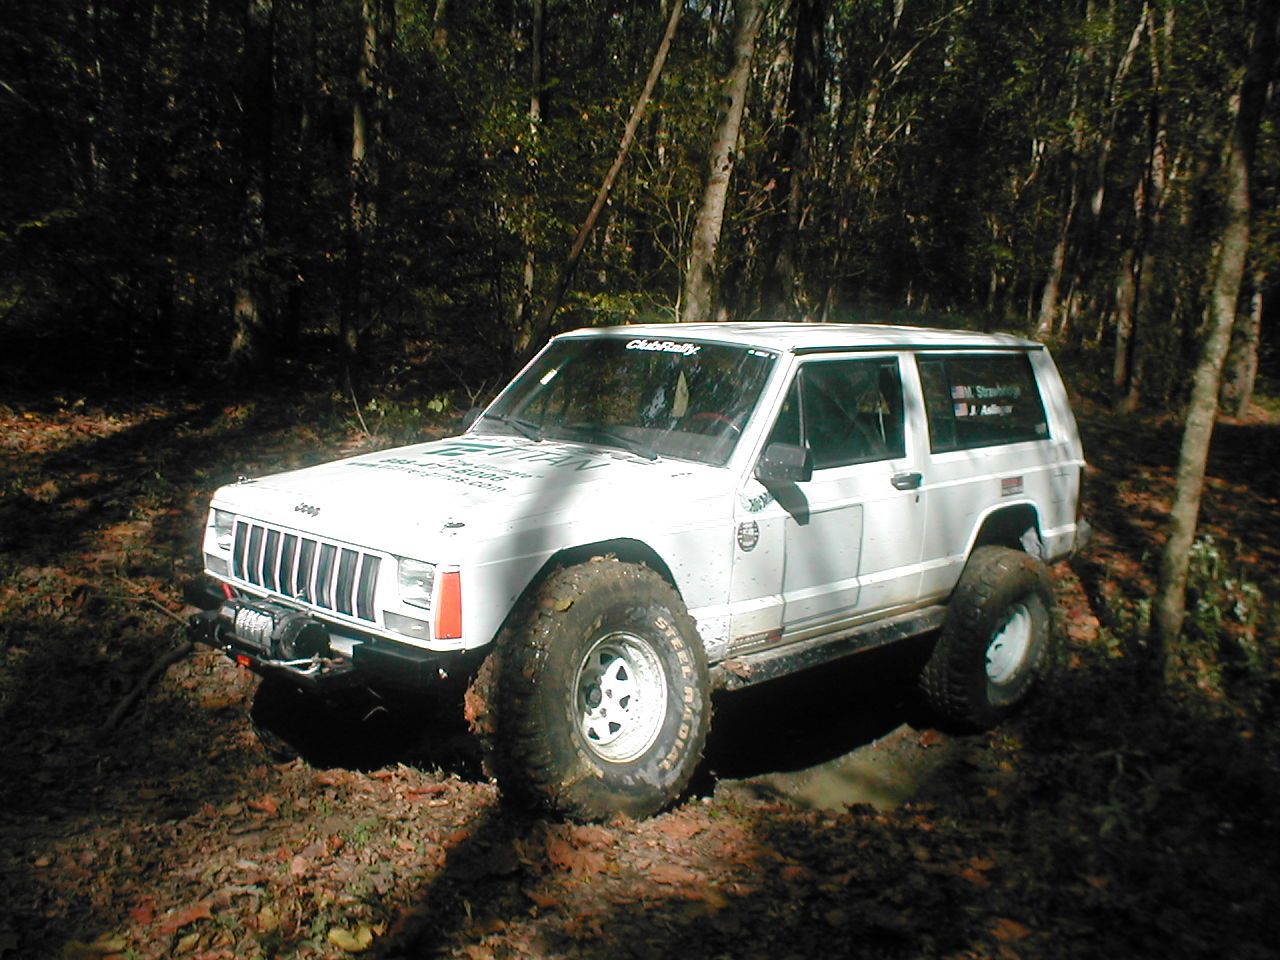 Jeep cherokee XJ off road